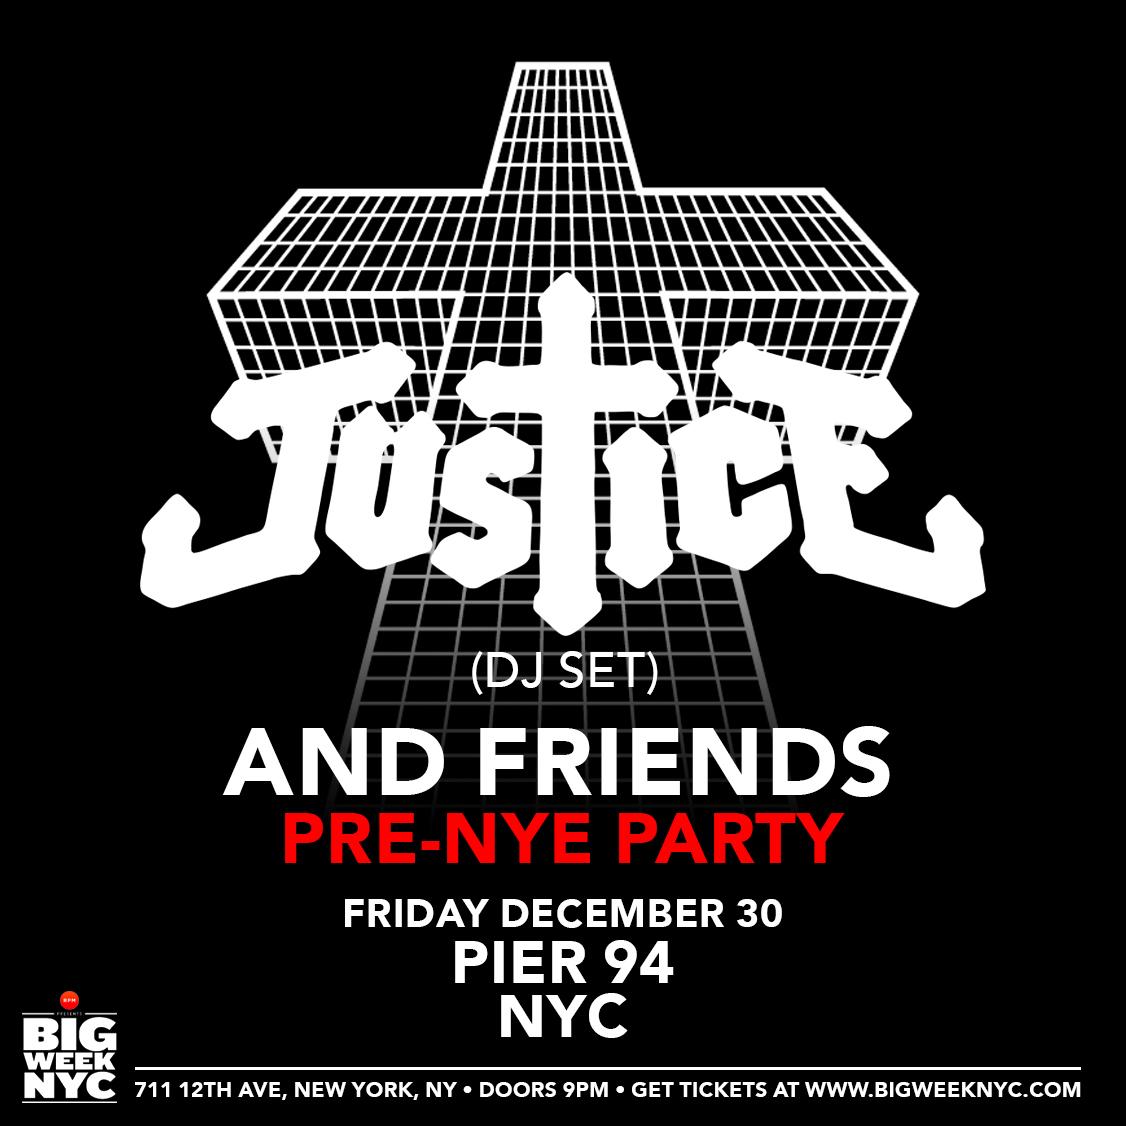 justice-nye-admat-2016-billboard-embed